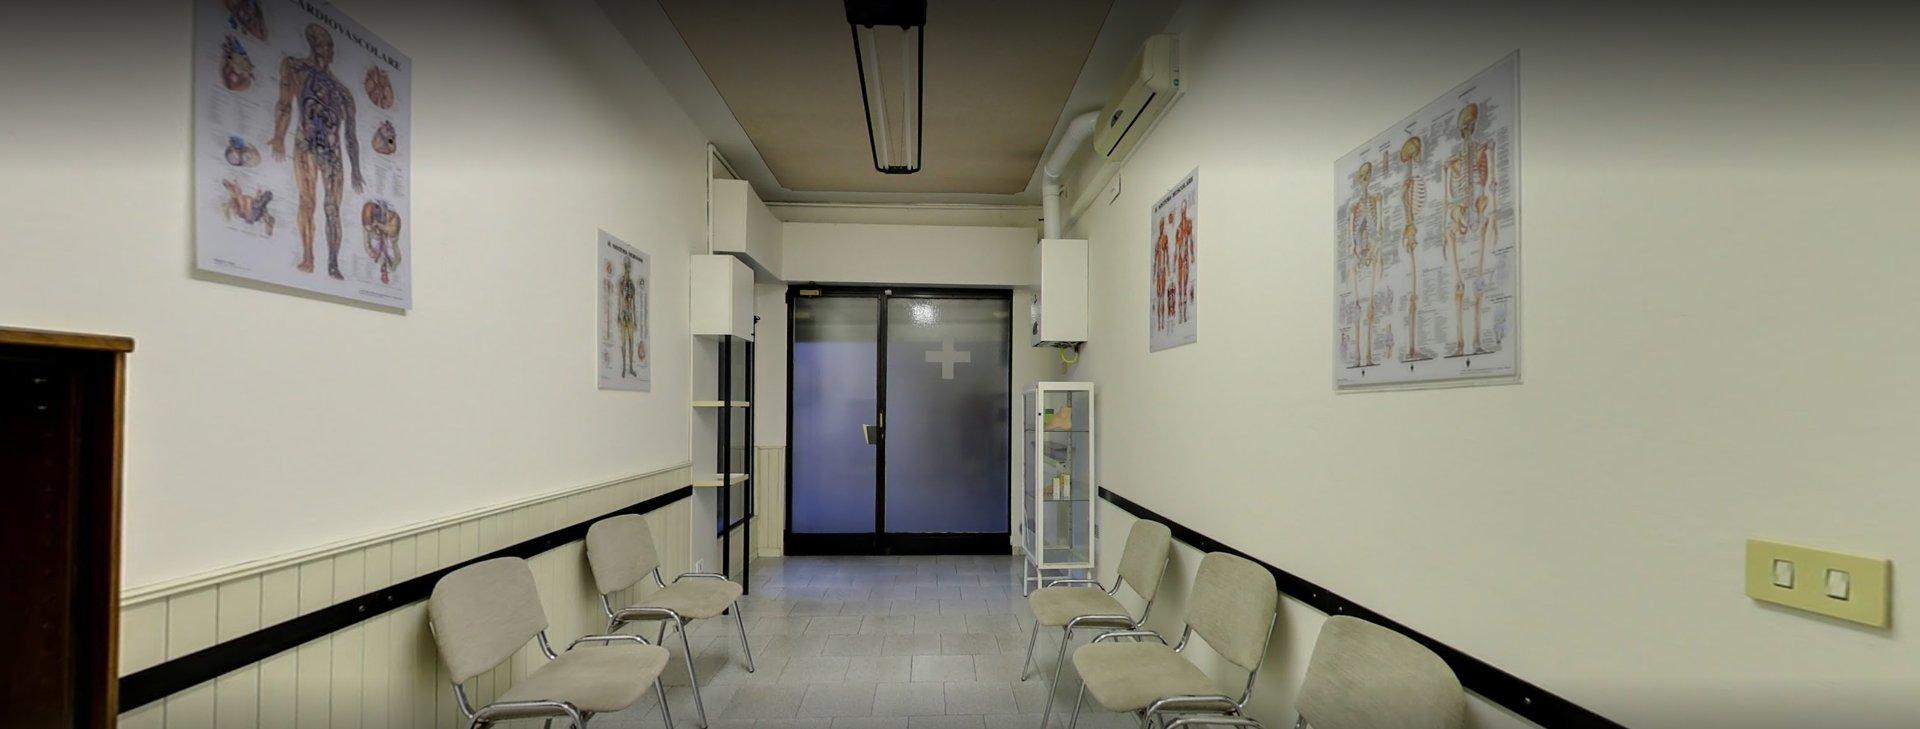 ambulatorio Farmacia Madonnina